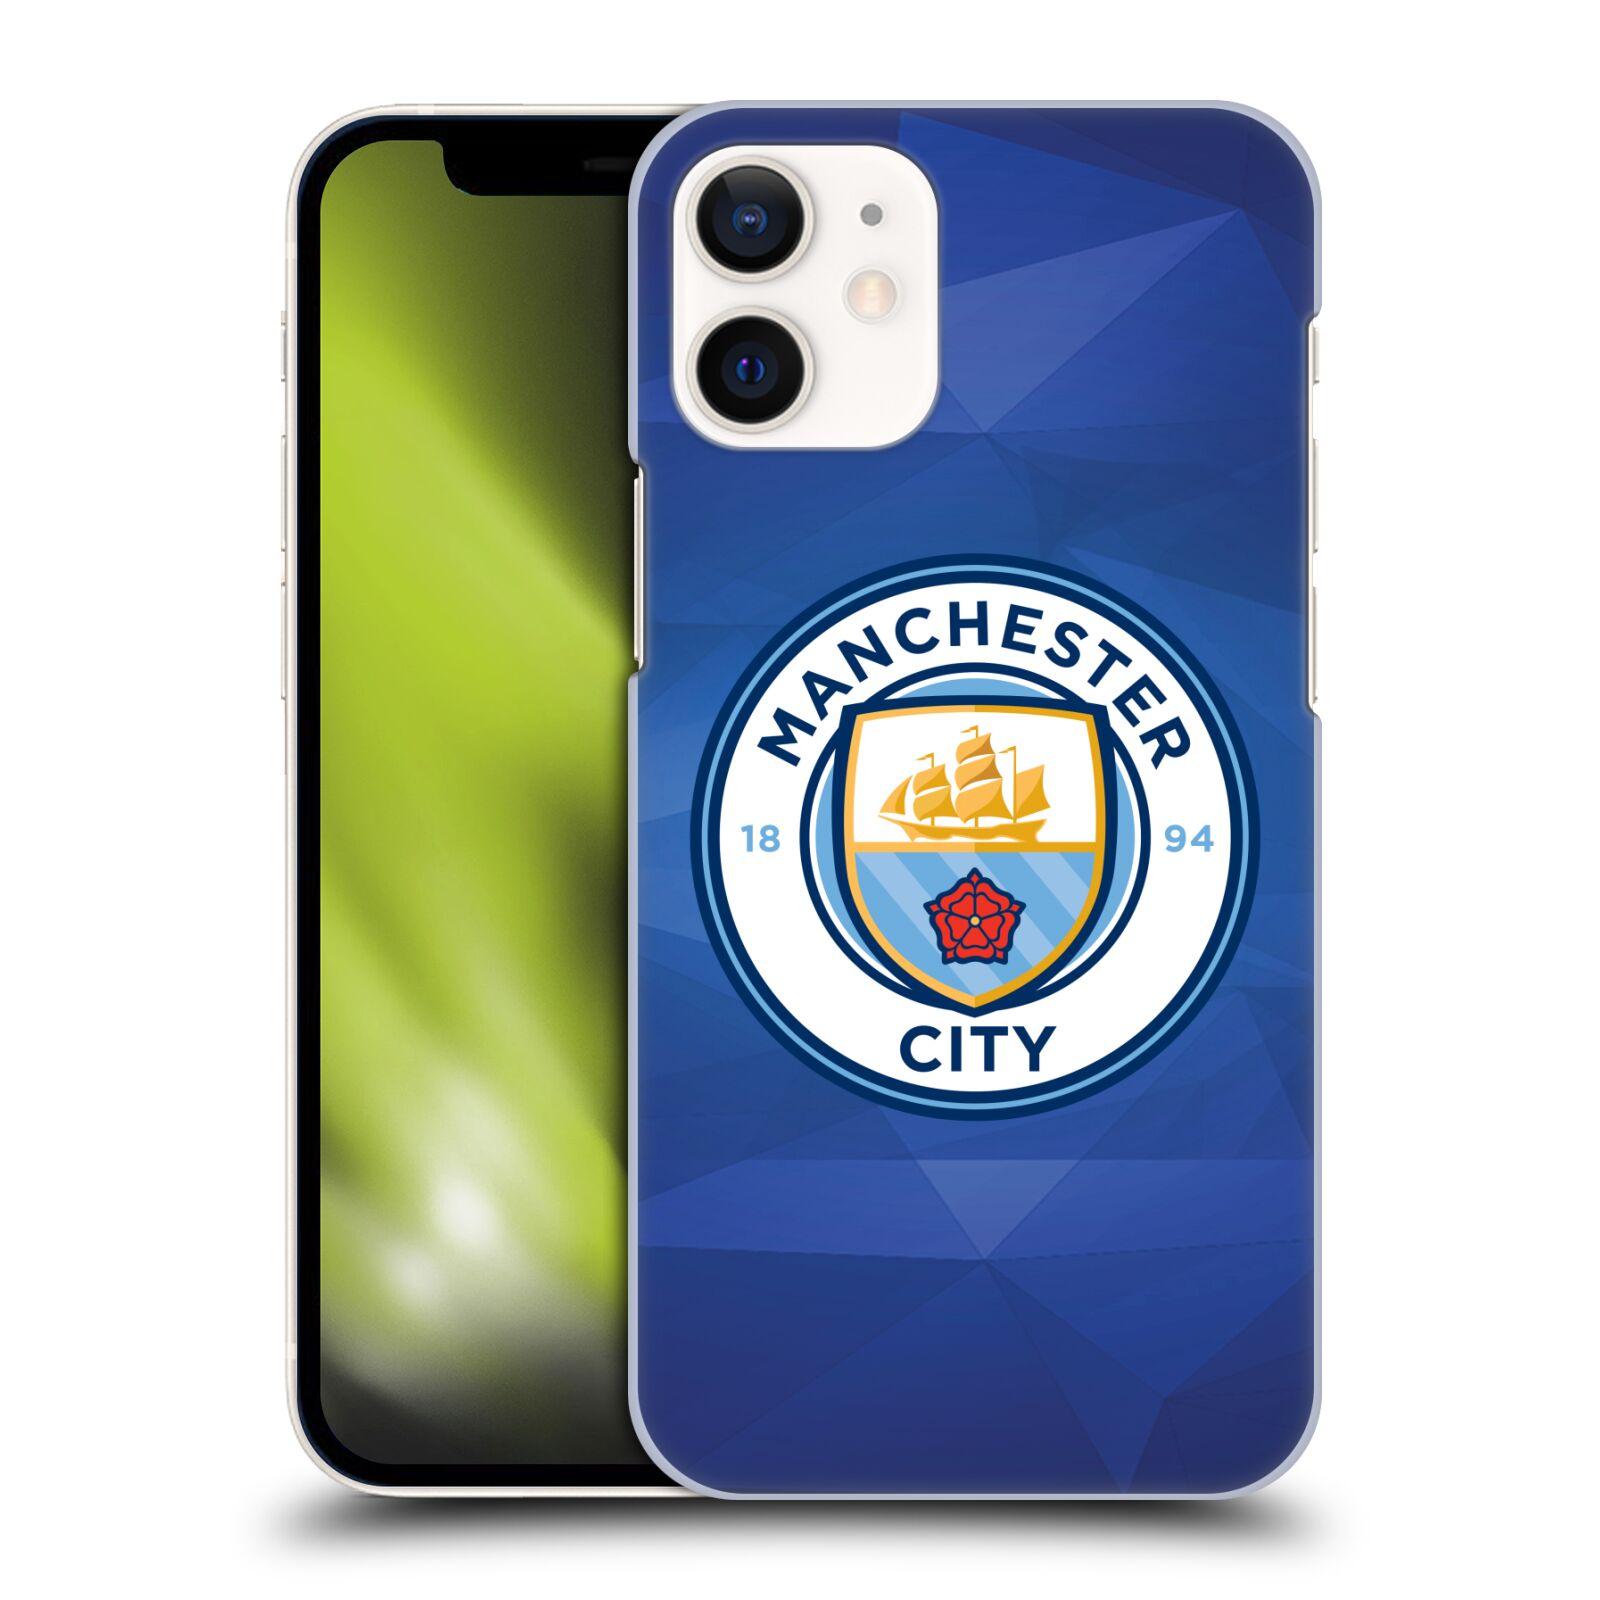 Plastové pouzdro na mobil Apple iPhone 12 Mini - Head Case - Manchester City FC - Modré nové logo